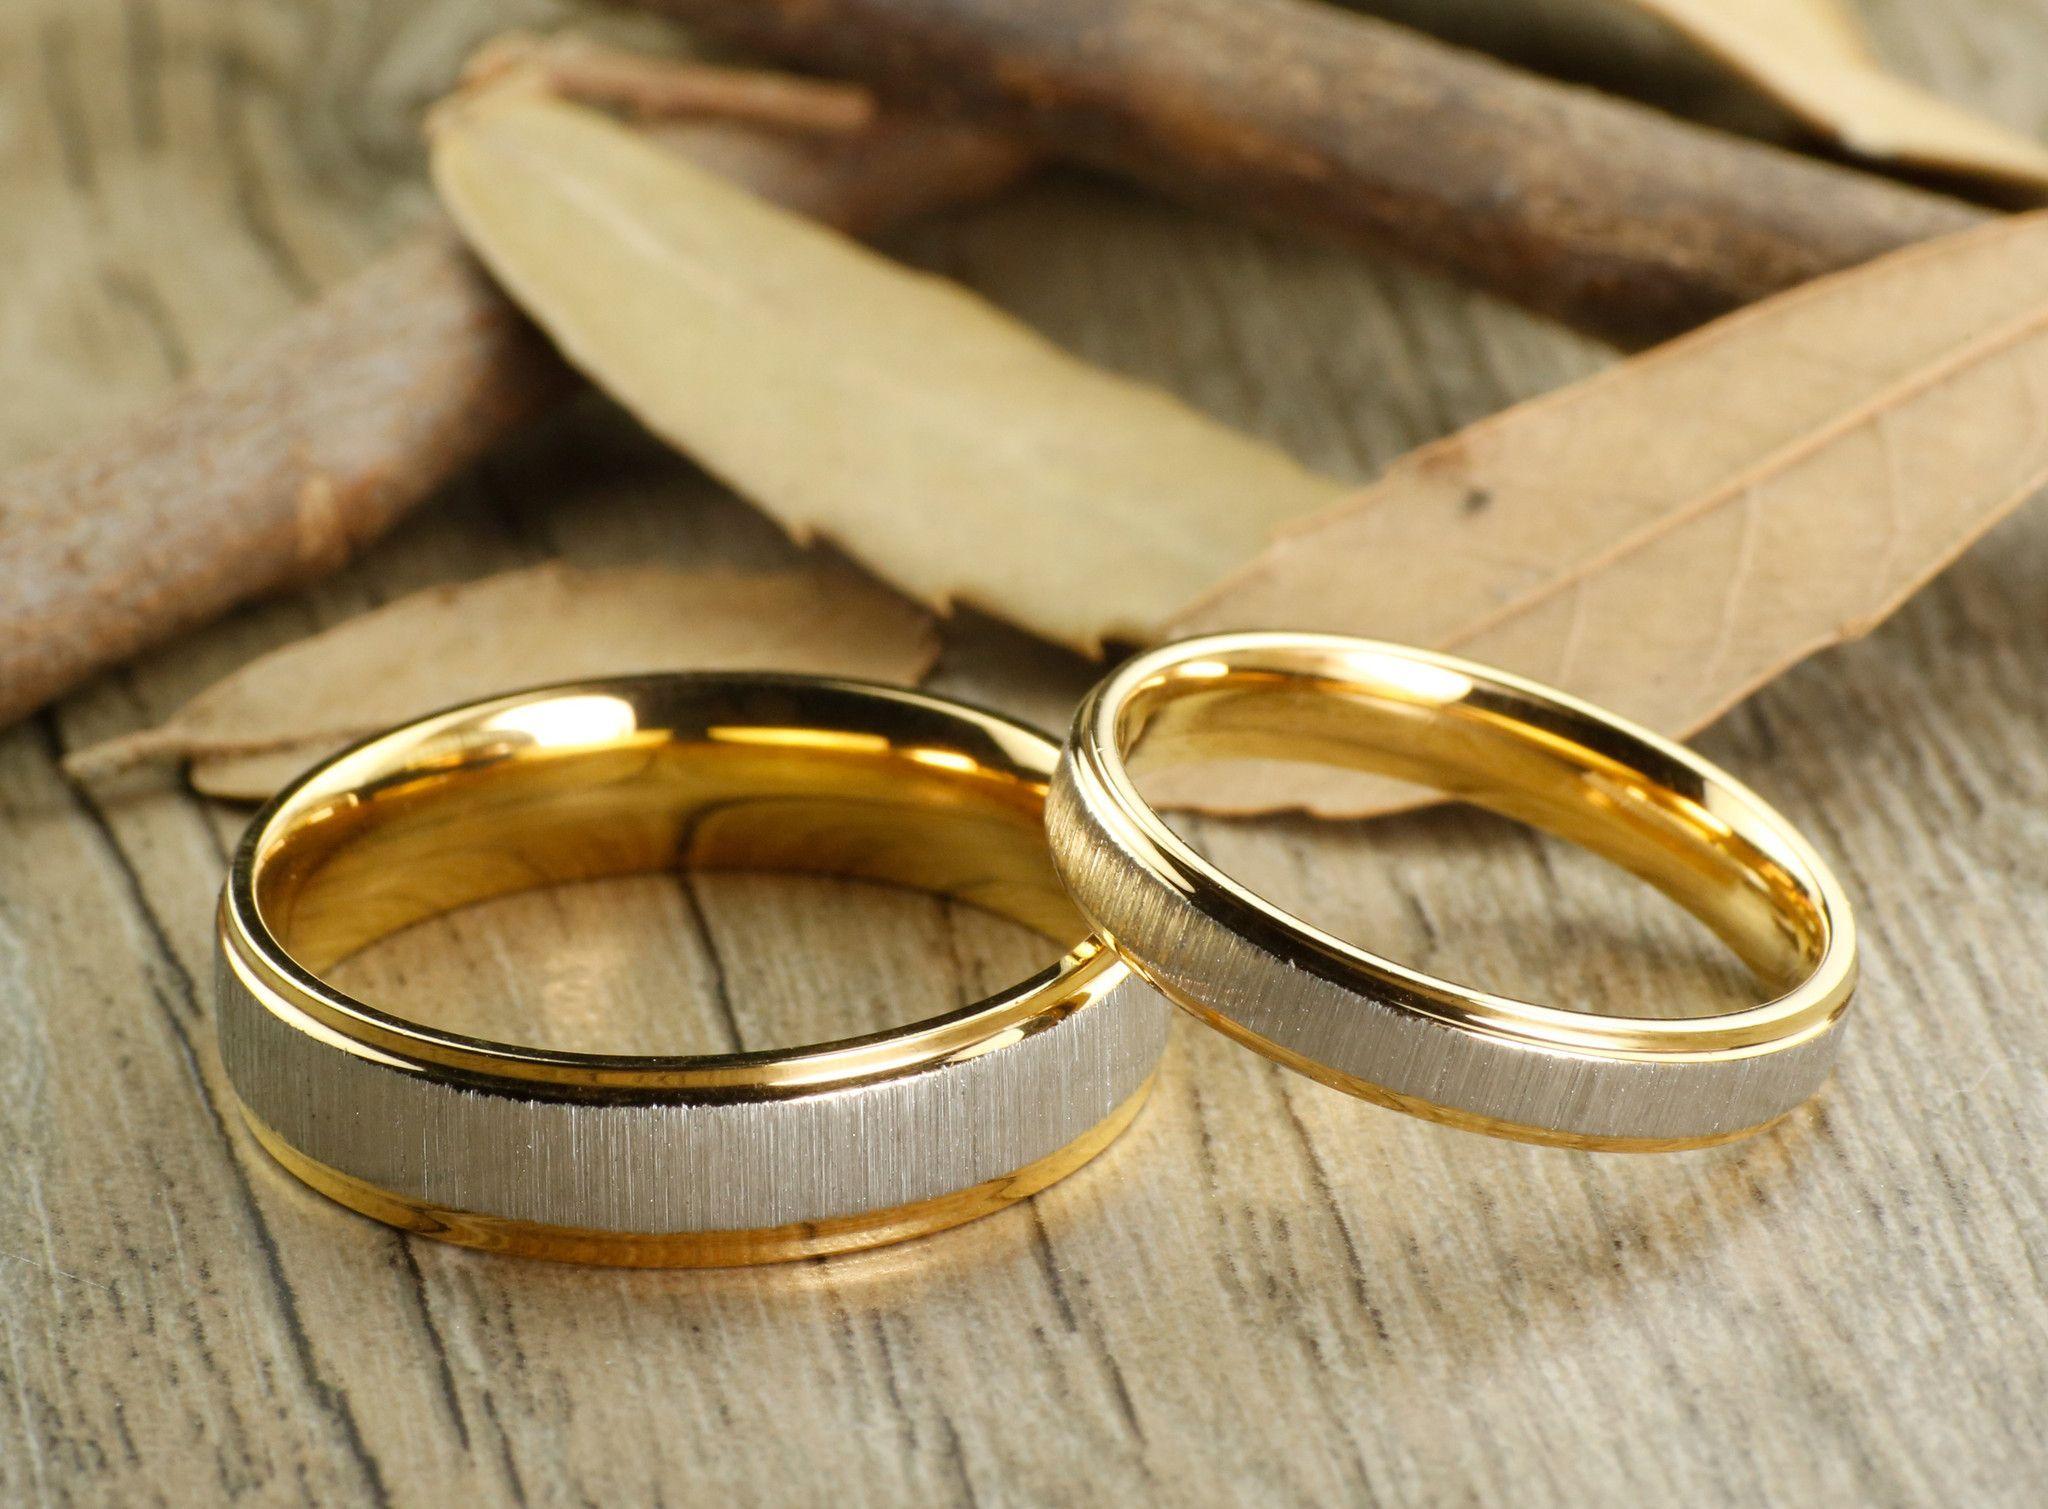 Handmade His and Her 18k Gold Wedding Titanium Rings Set